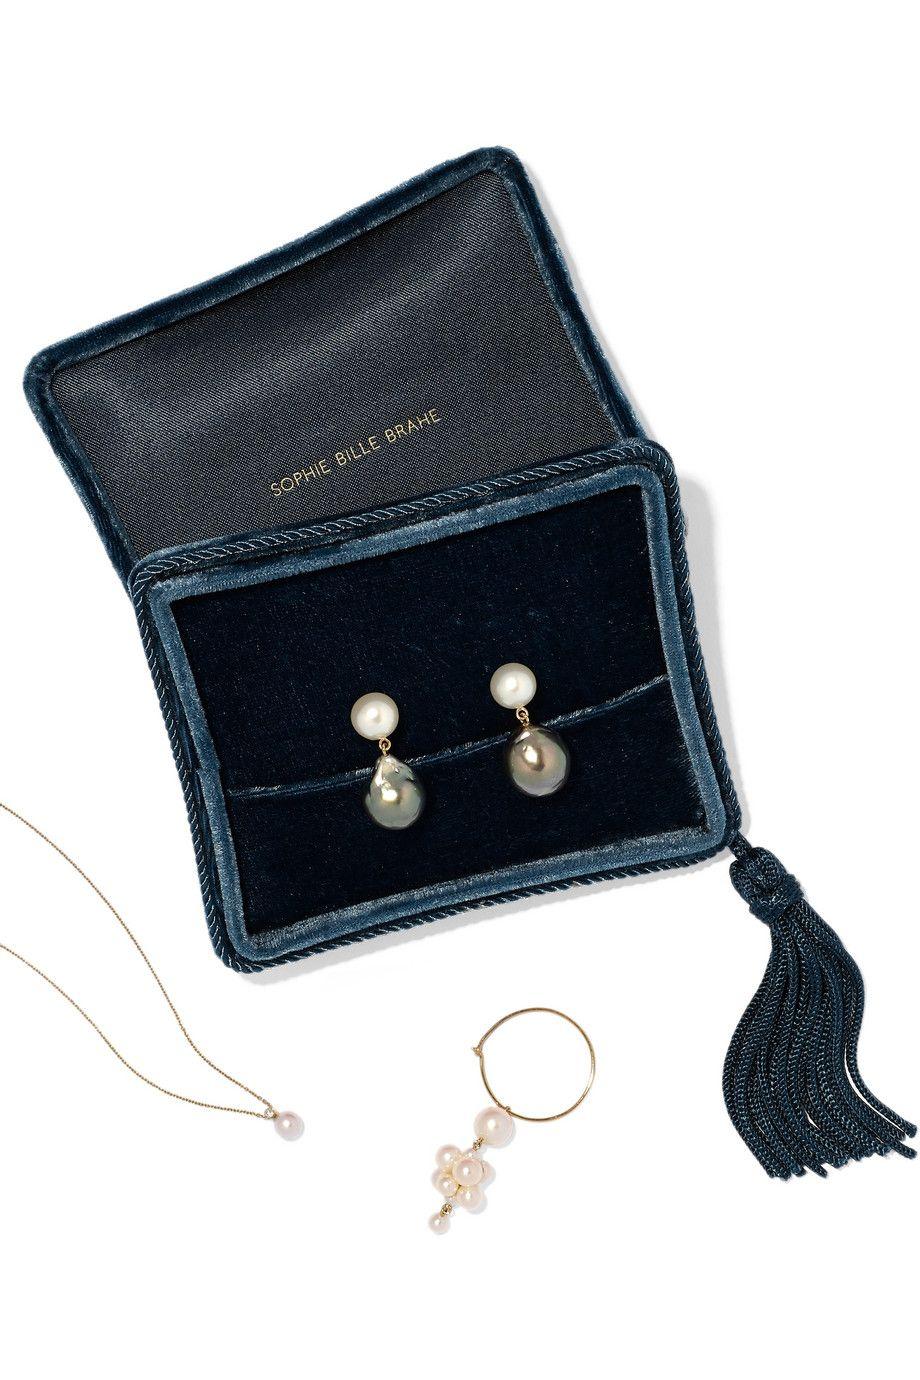 29+ Sophie bille brahe velvet jewelry box info